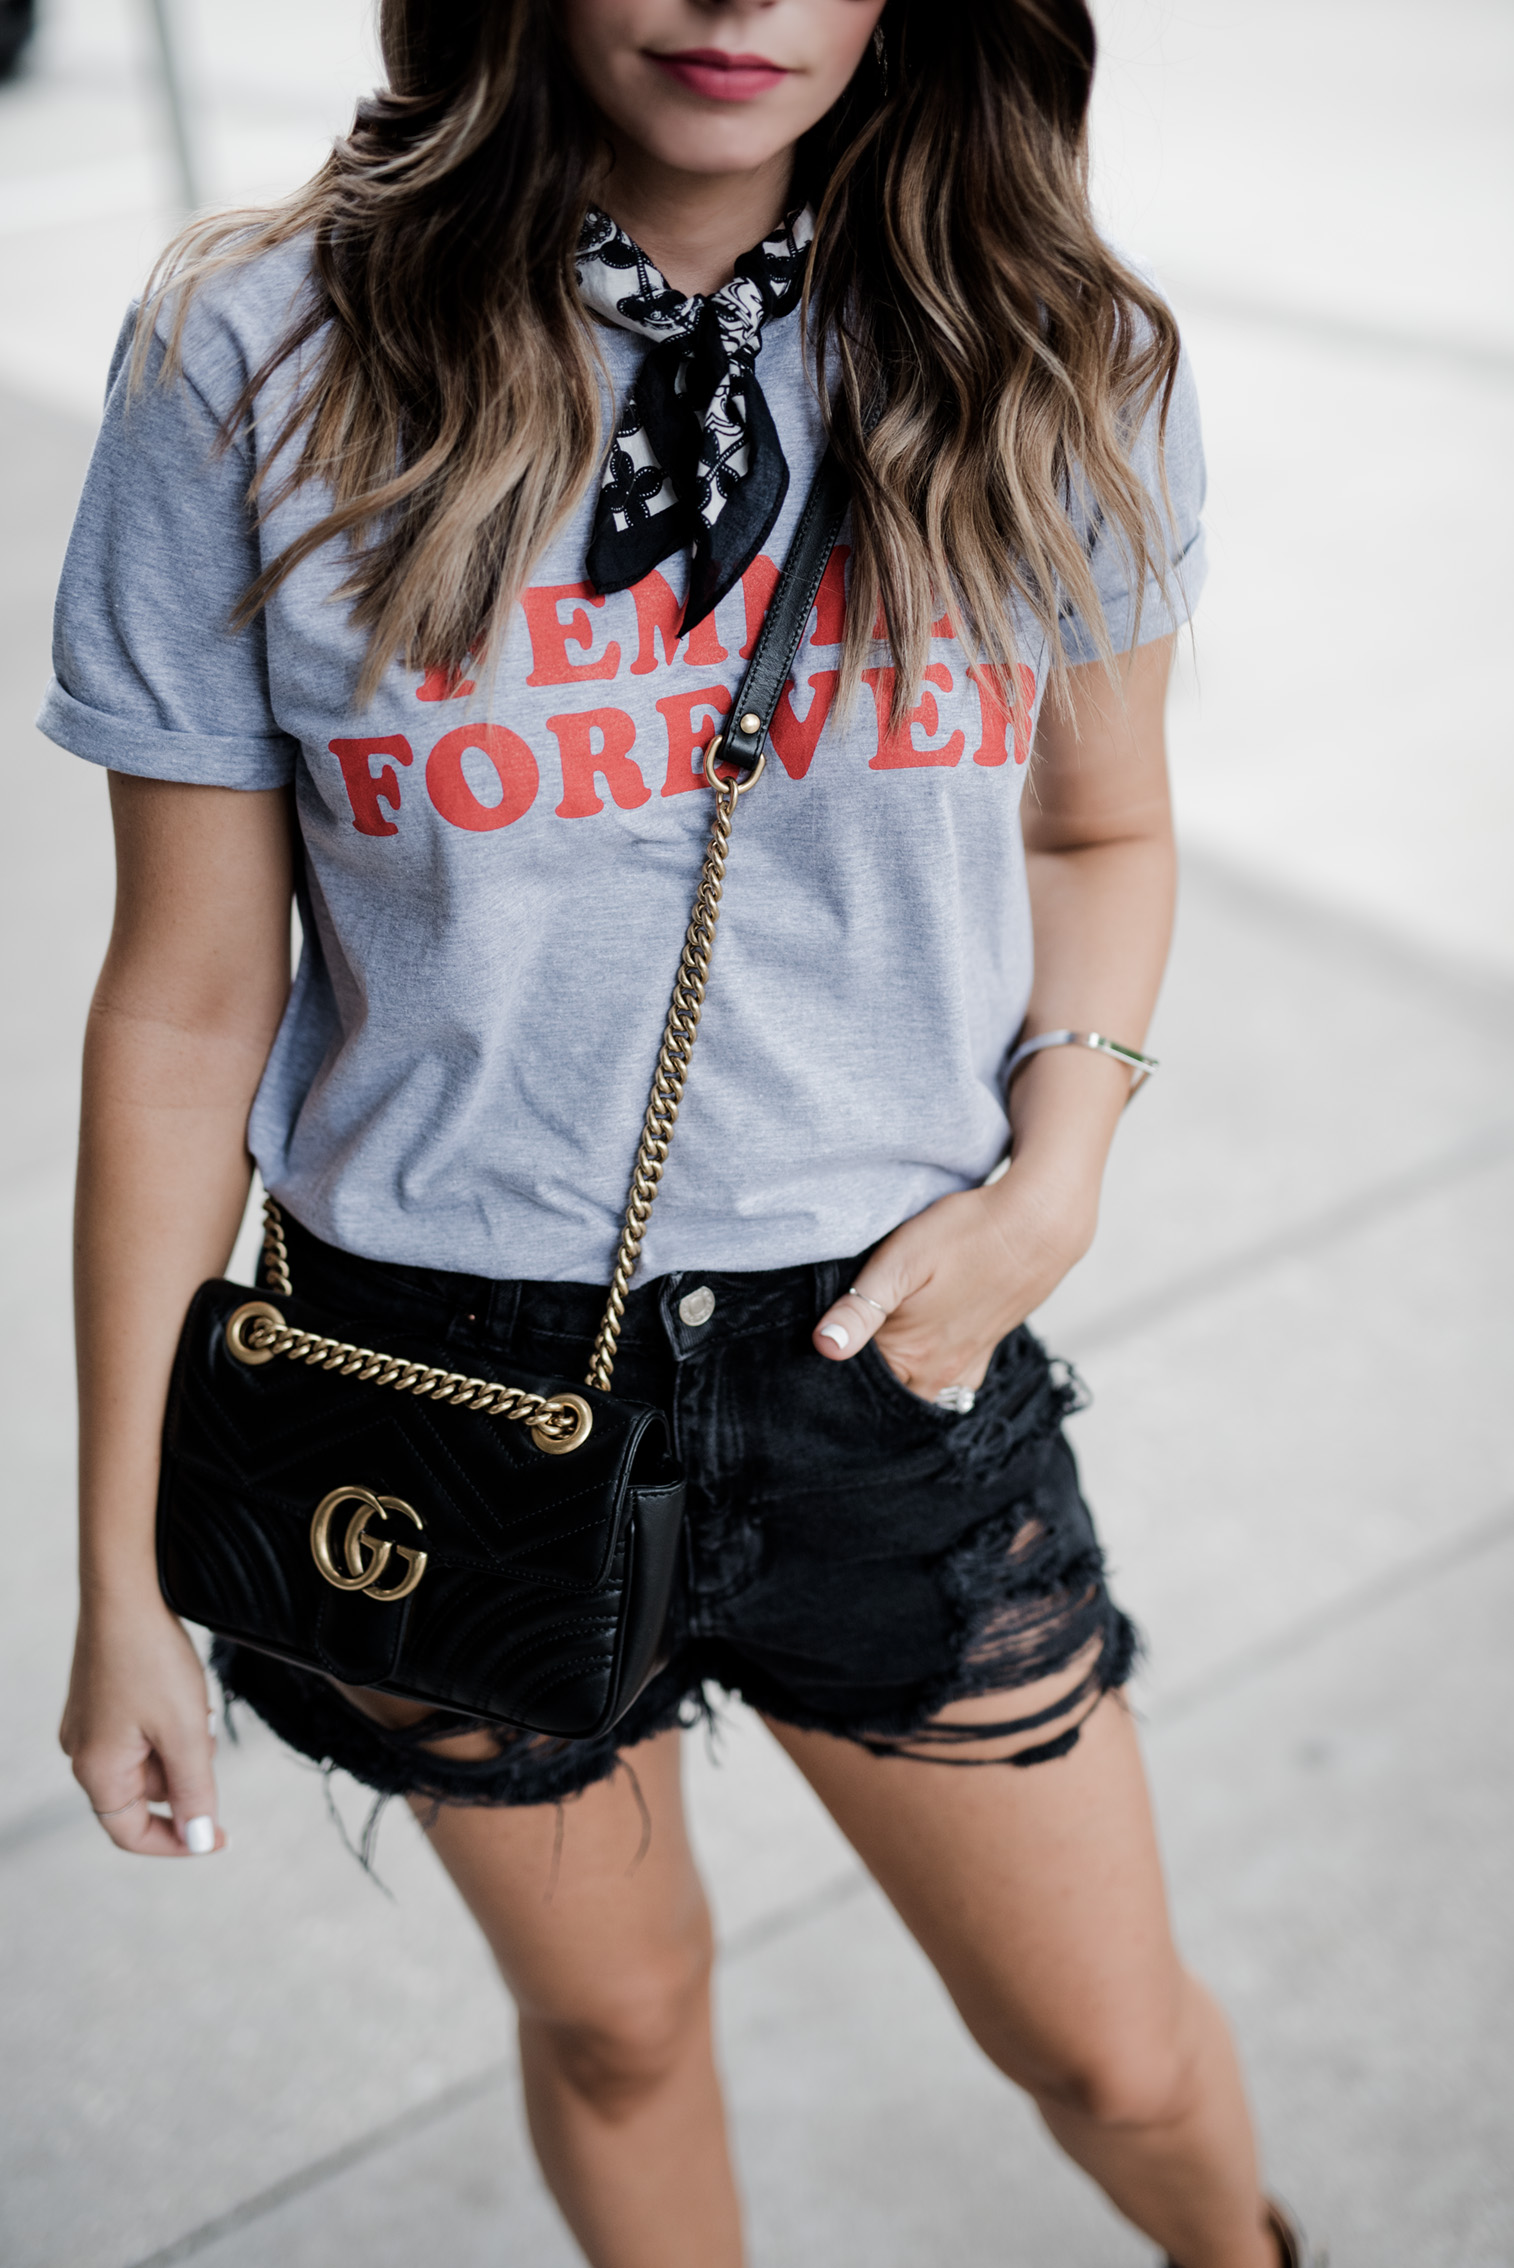 Tiffany Jais Houston fashion and lifestyle blogger | street style, Graphic tee's , necktie scarf outfits,